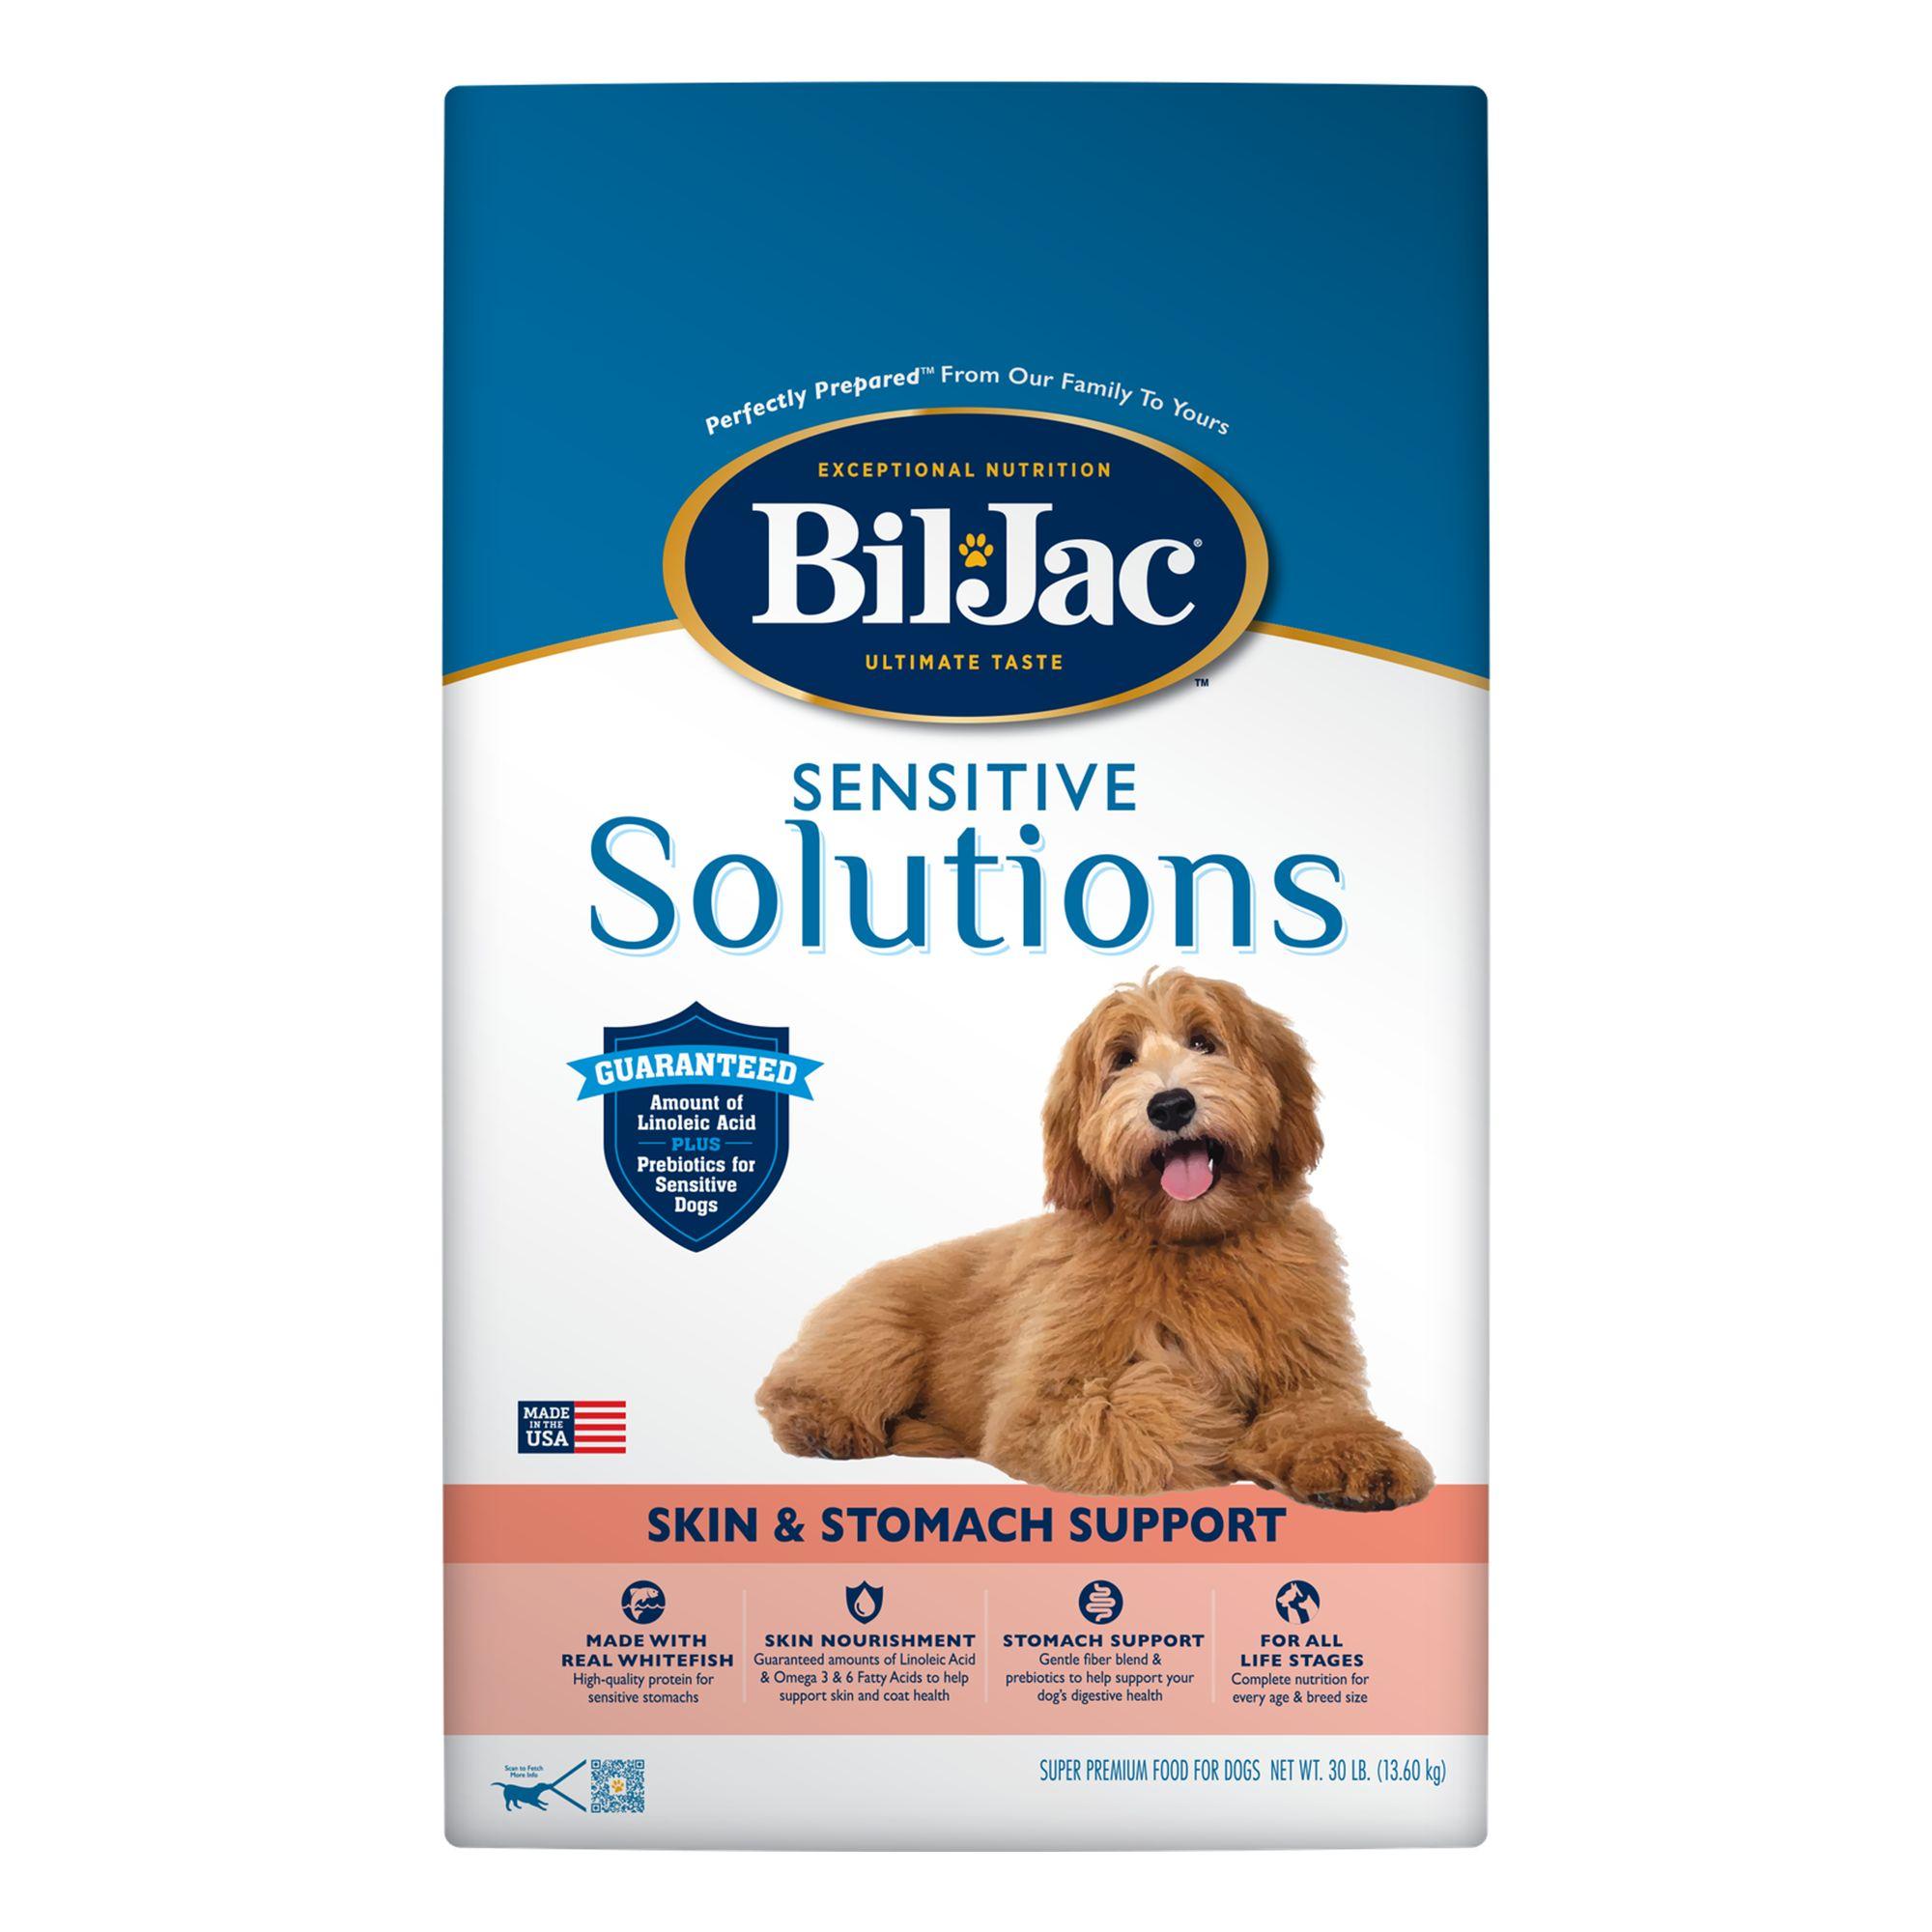 Petsmart Bil Jac Senior Dog Food